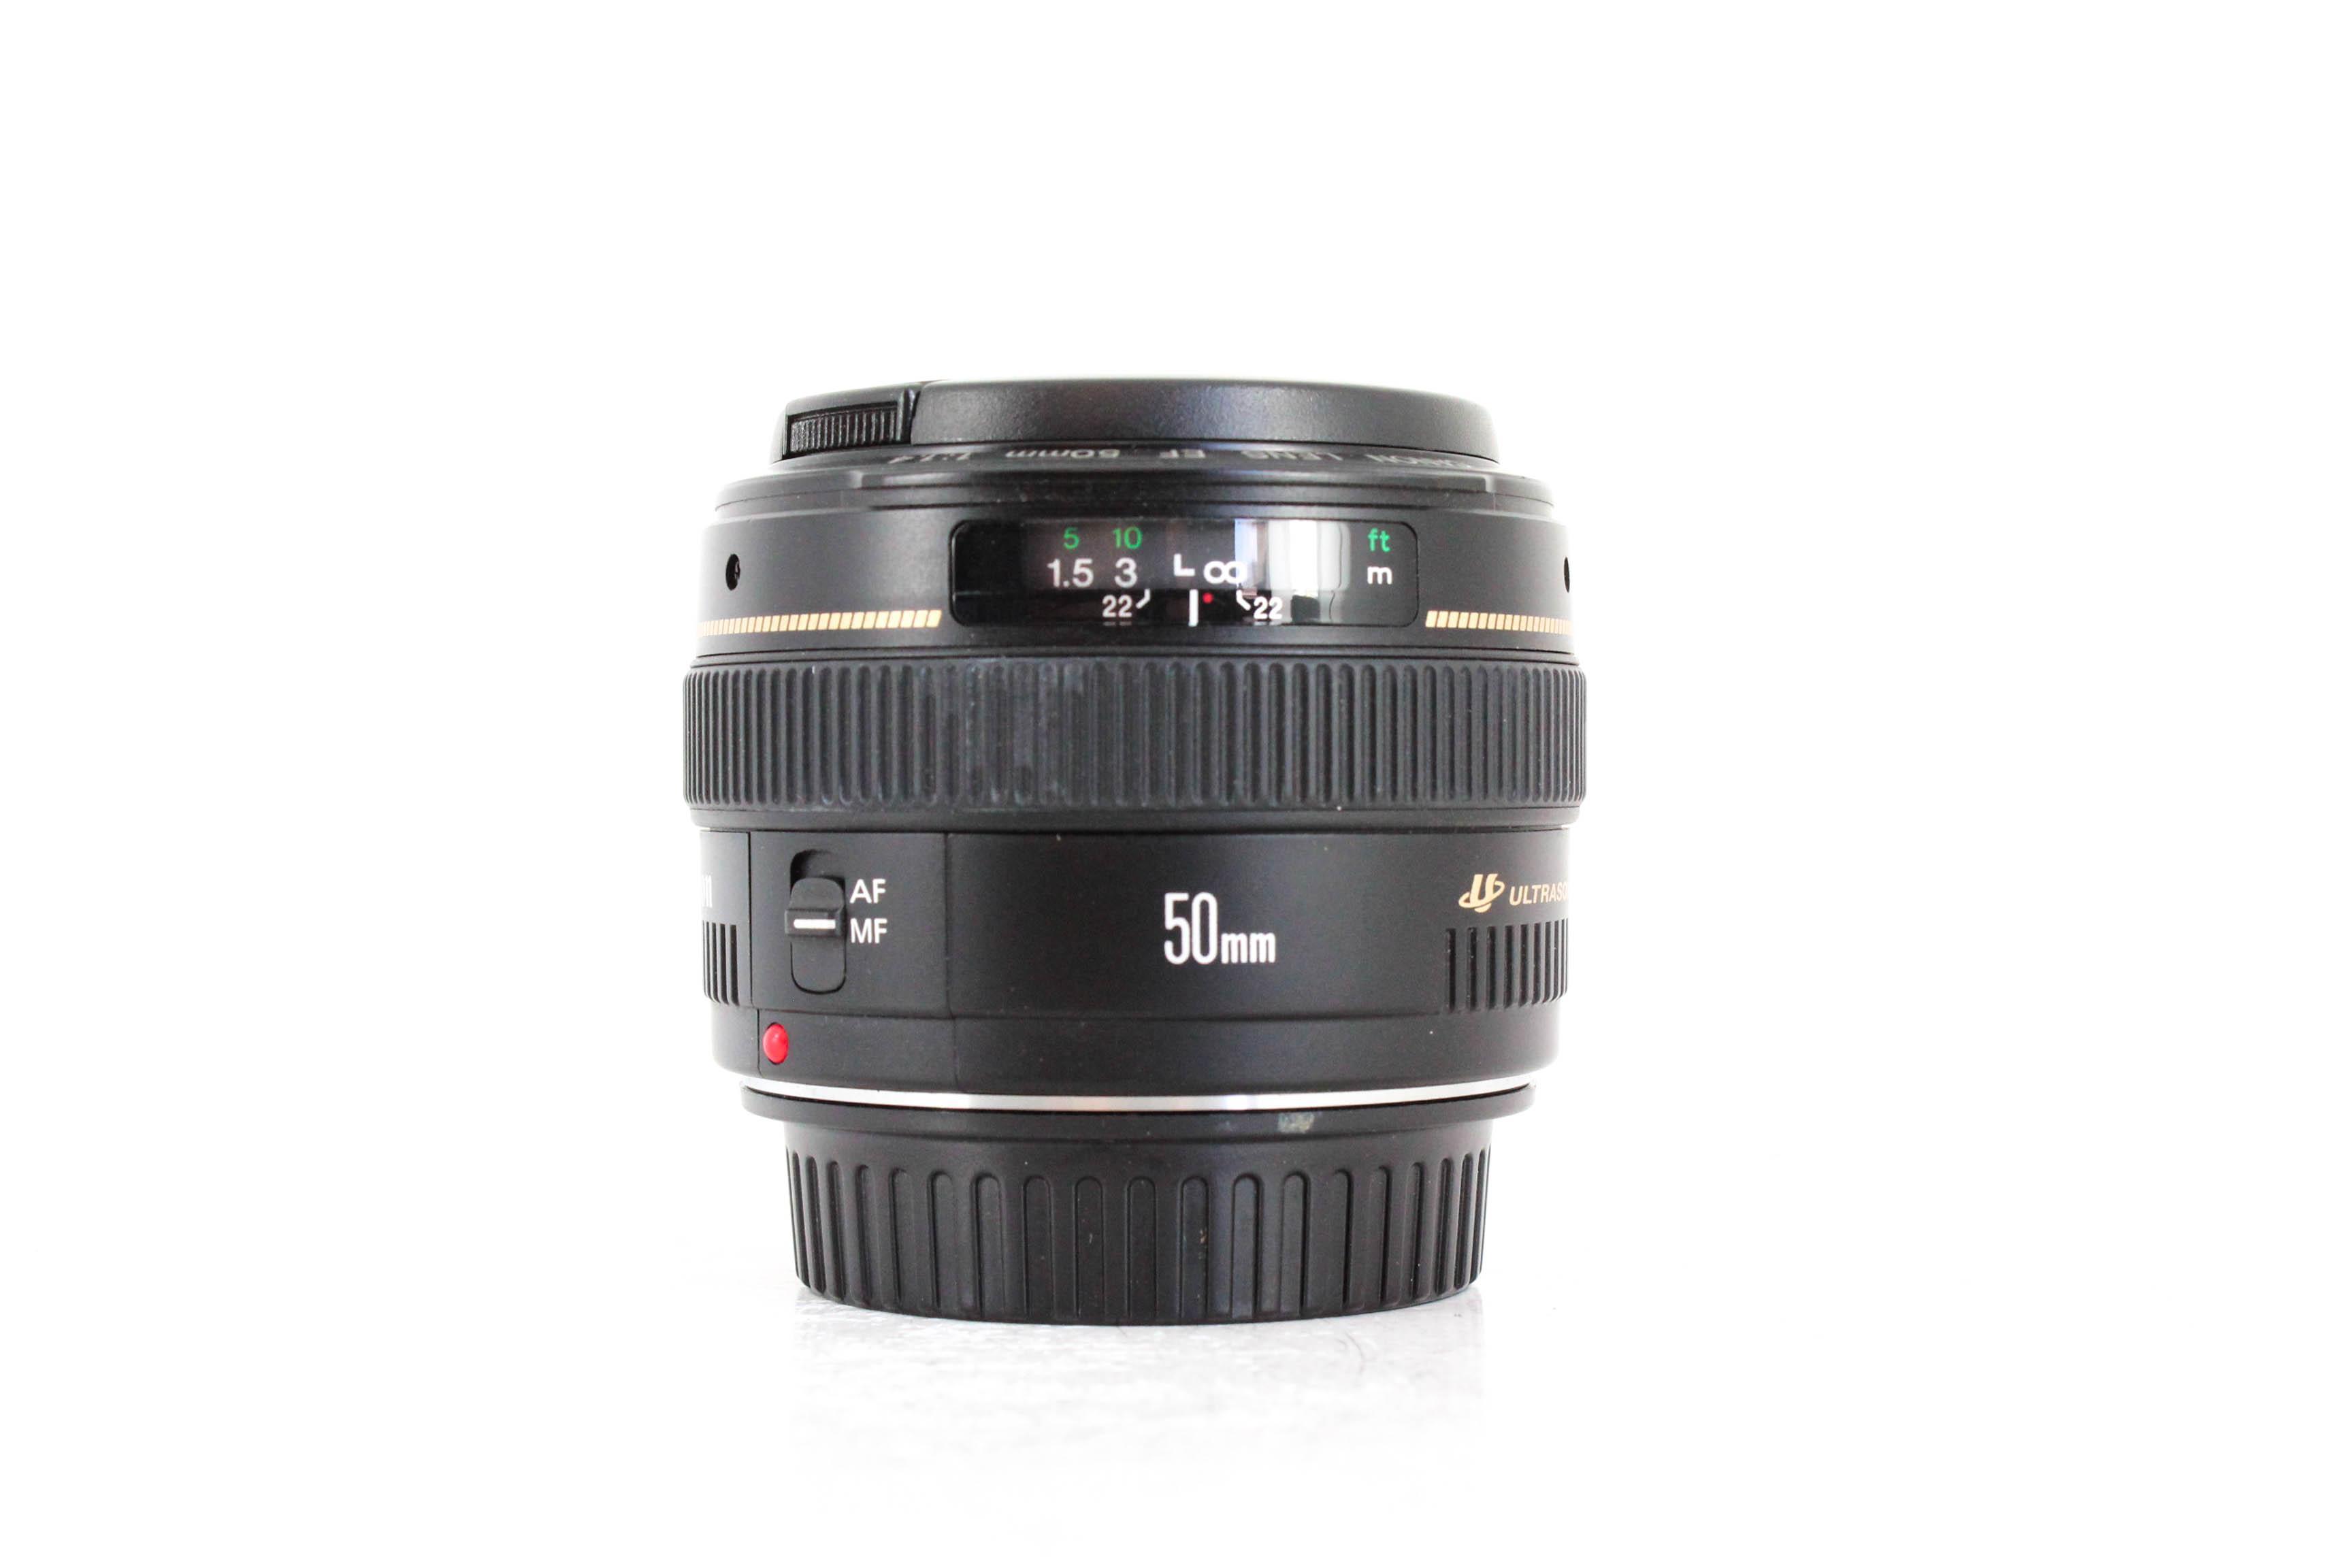 canon 50mm f1.4 image